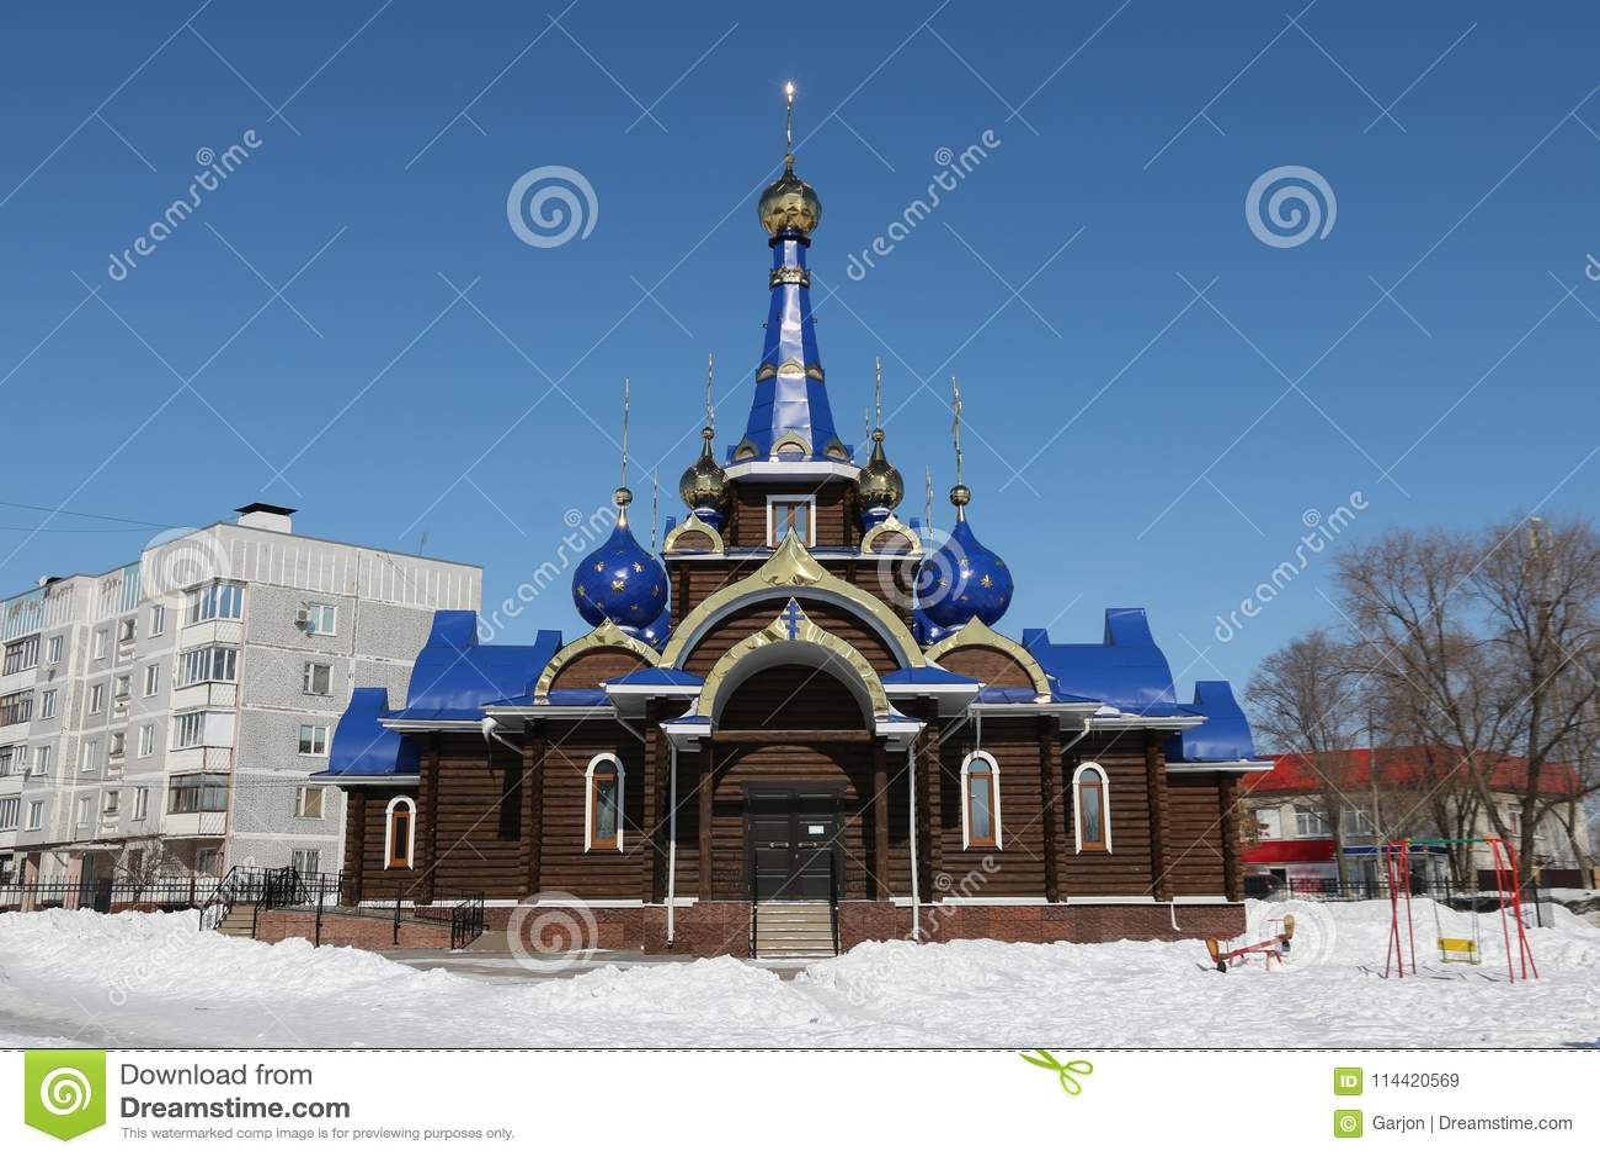 Kirchehauben mit Kreuzen bügel Gegen den blauen Himmel im wint